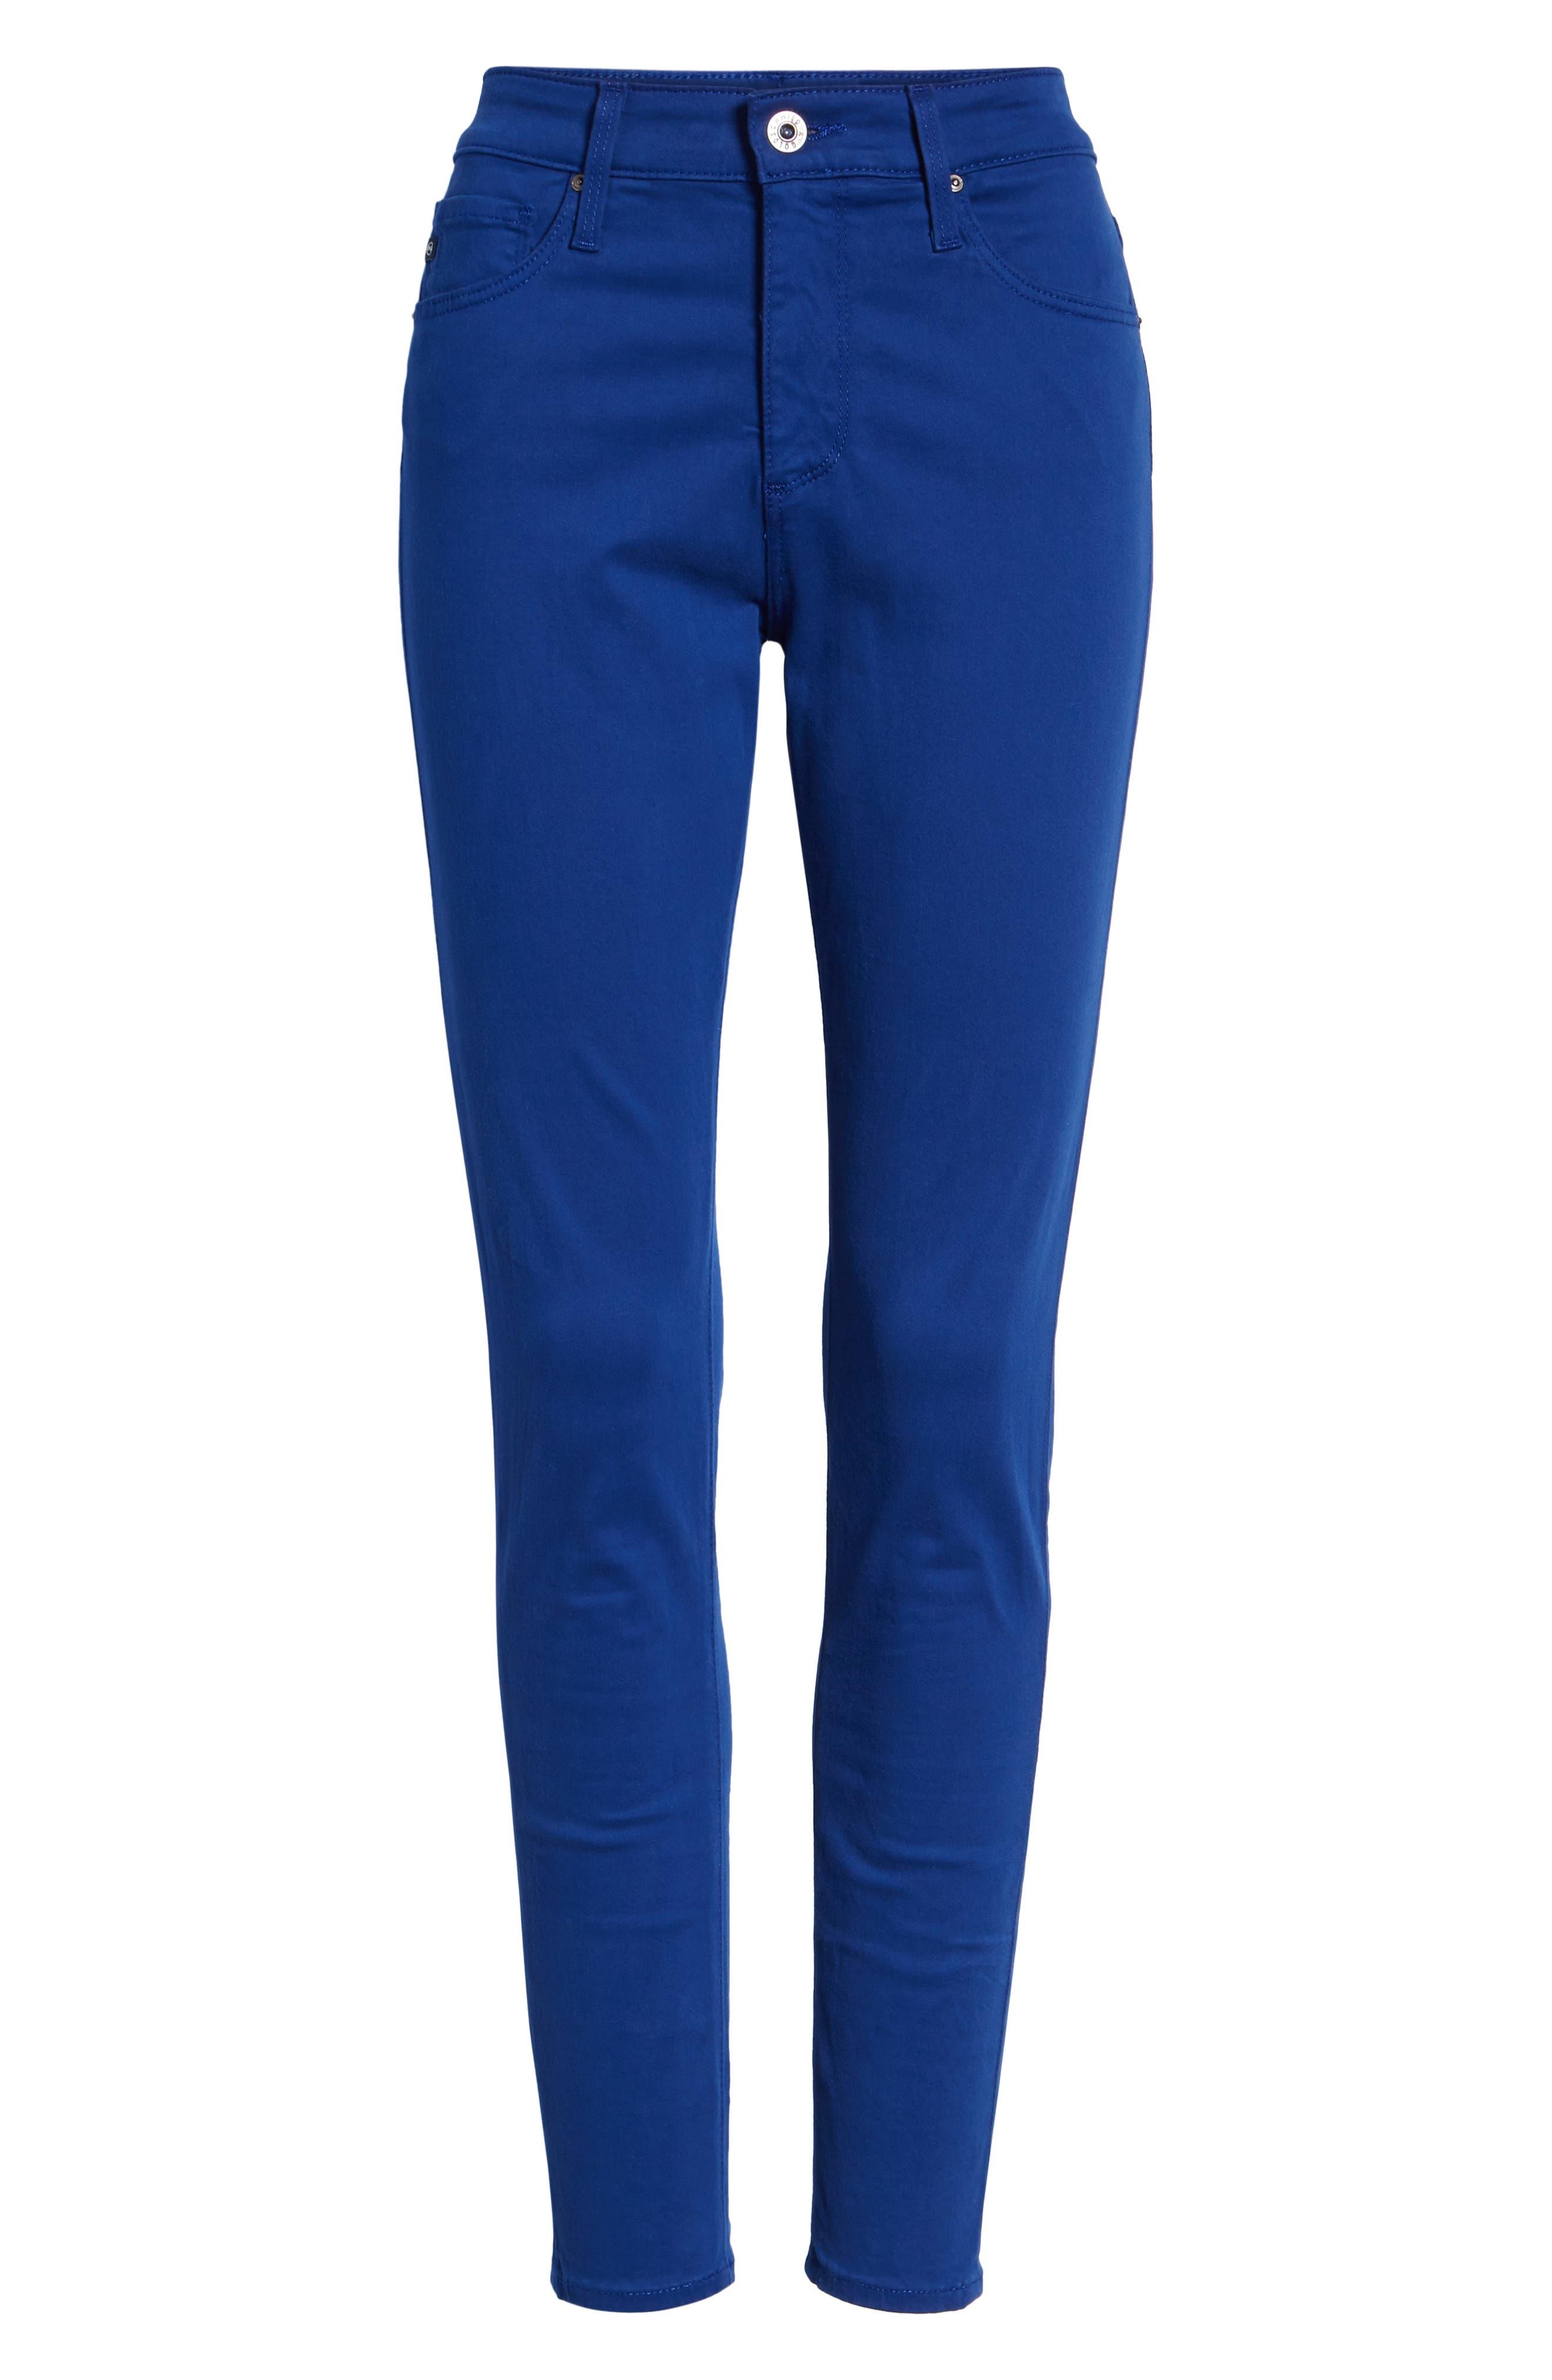 Farrah High Waist Ankle Skinny Jeans,                             Alternate thumbnail 7, color,                             EGYPTIAN BLUE